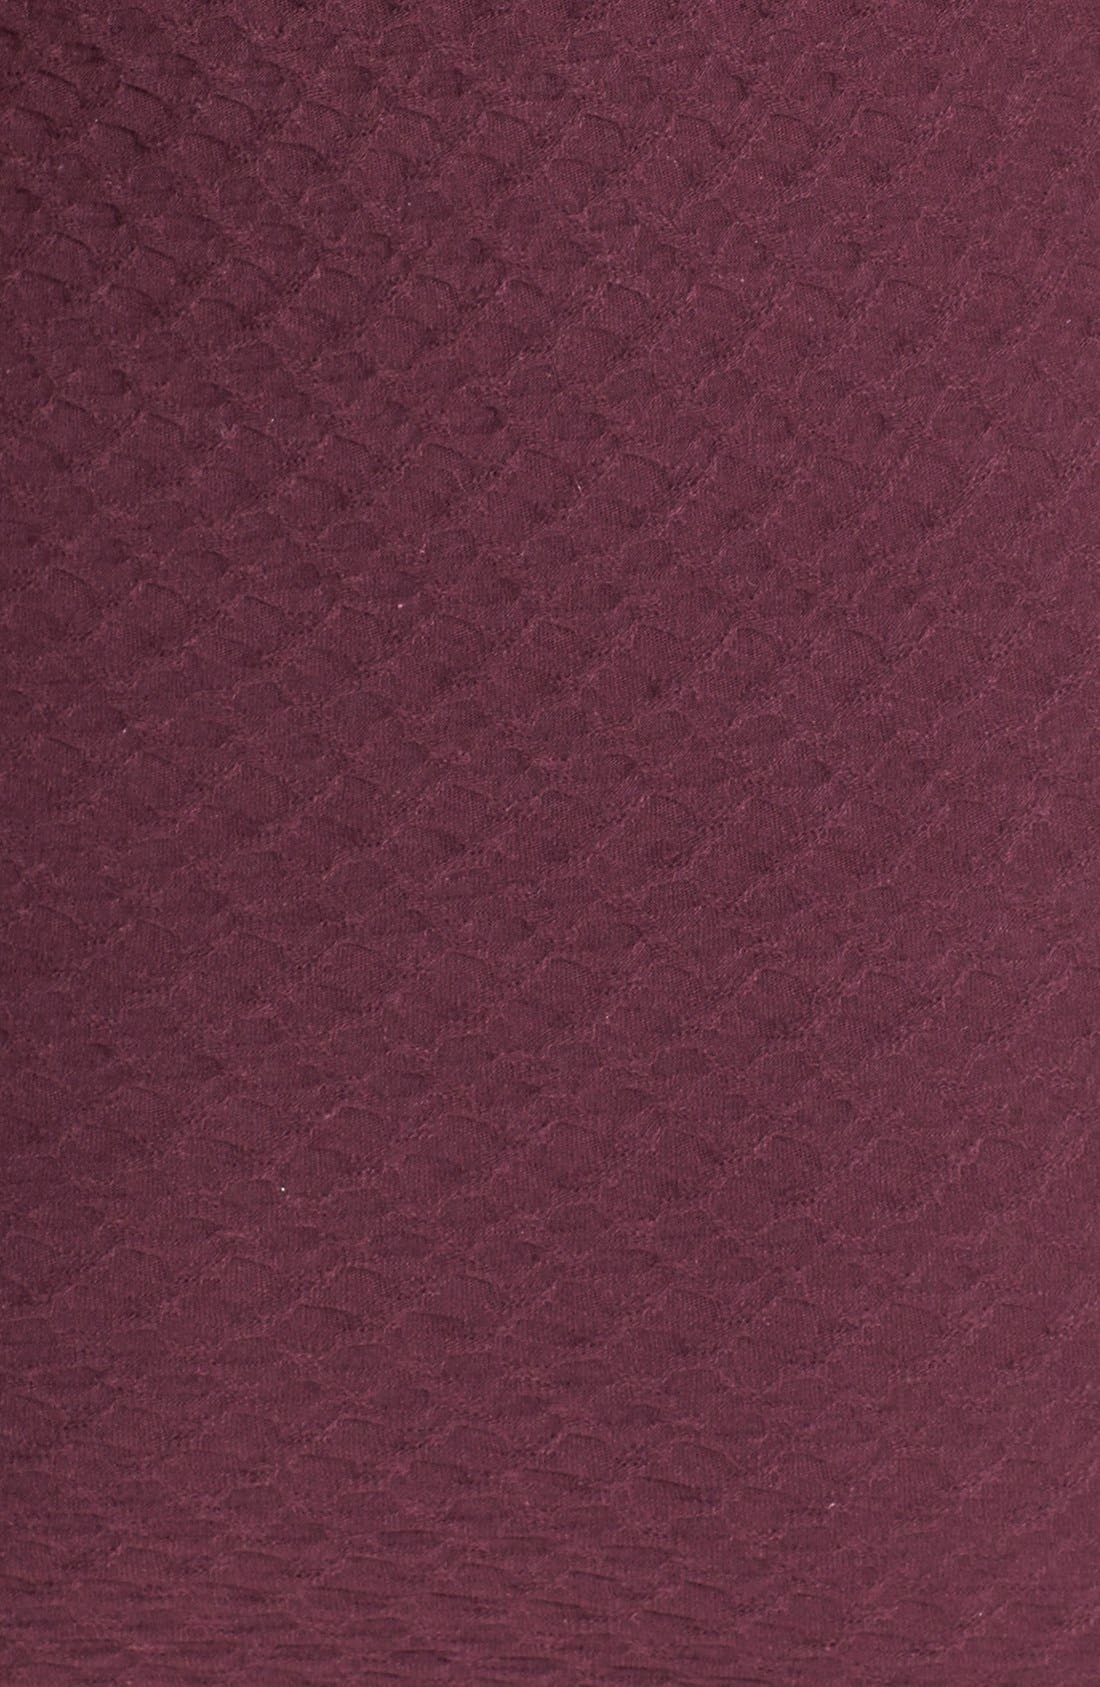 Alternate Image 3  - Topshop Cutout Textured Body-Con Dress